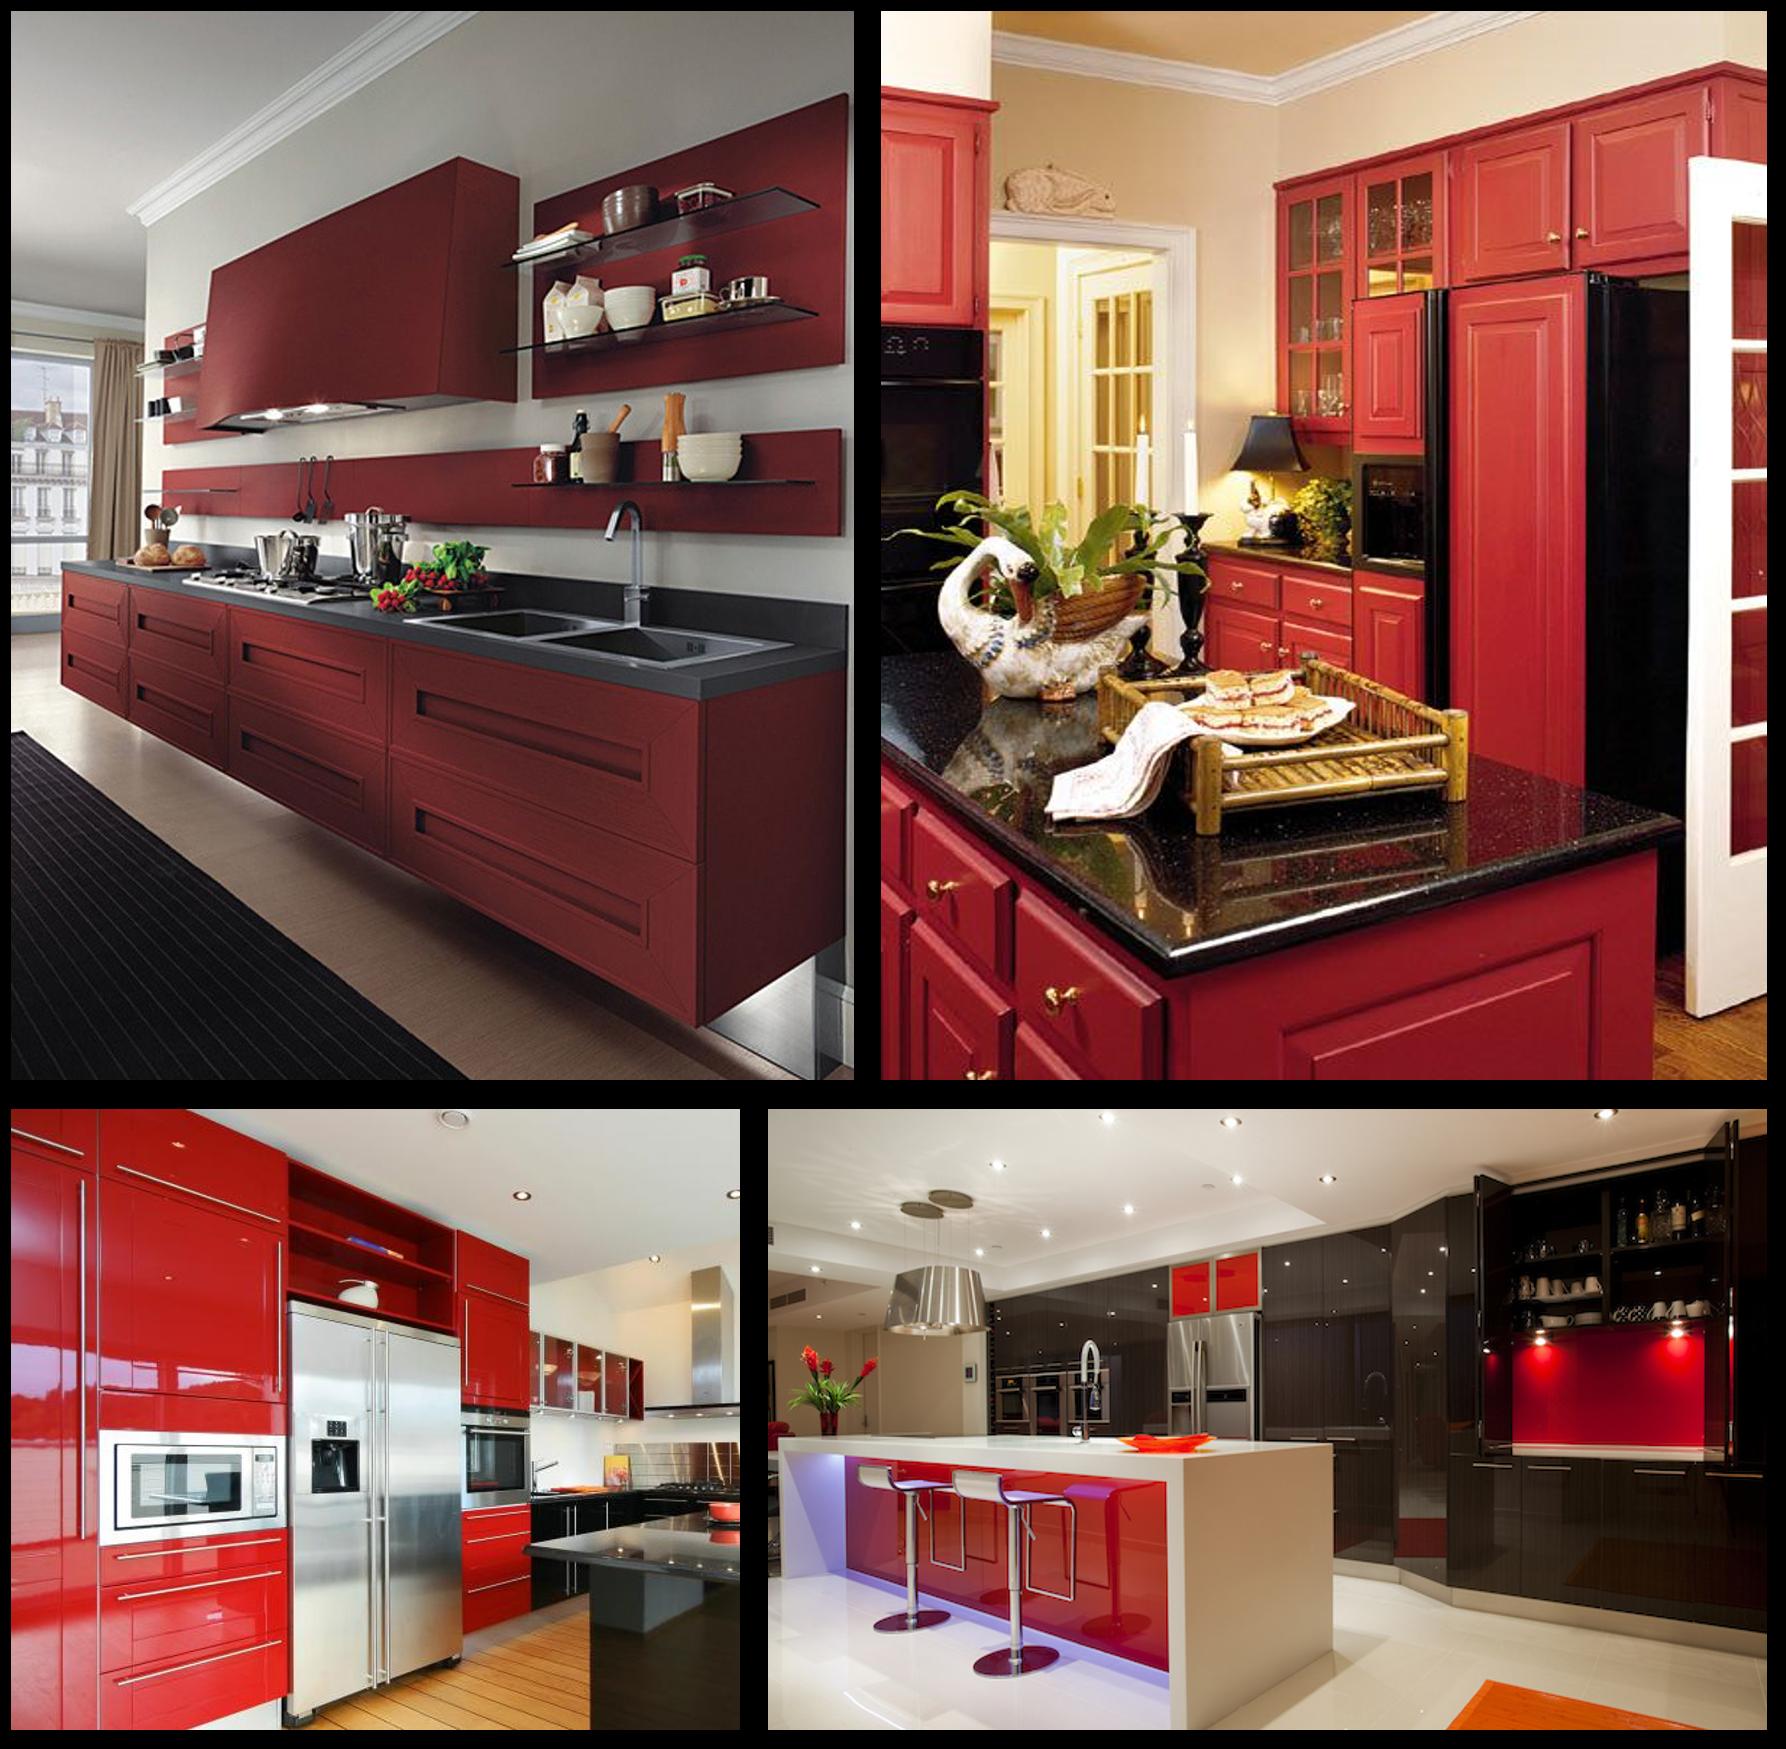 کابینت آشپزخانه قرمز